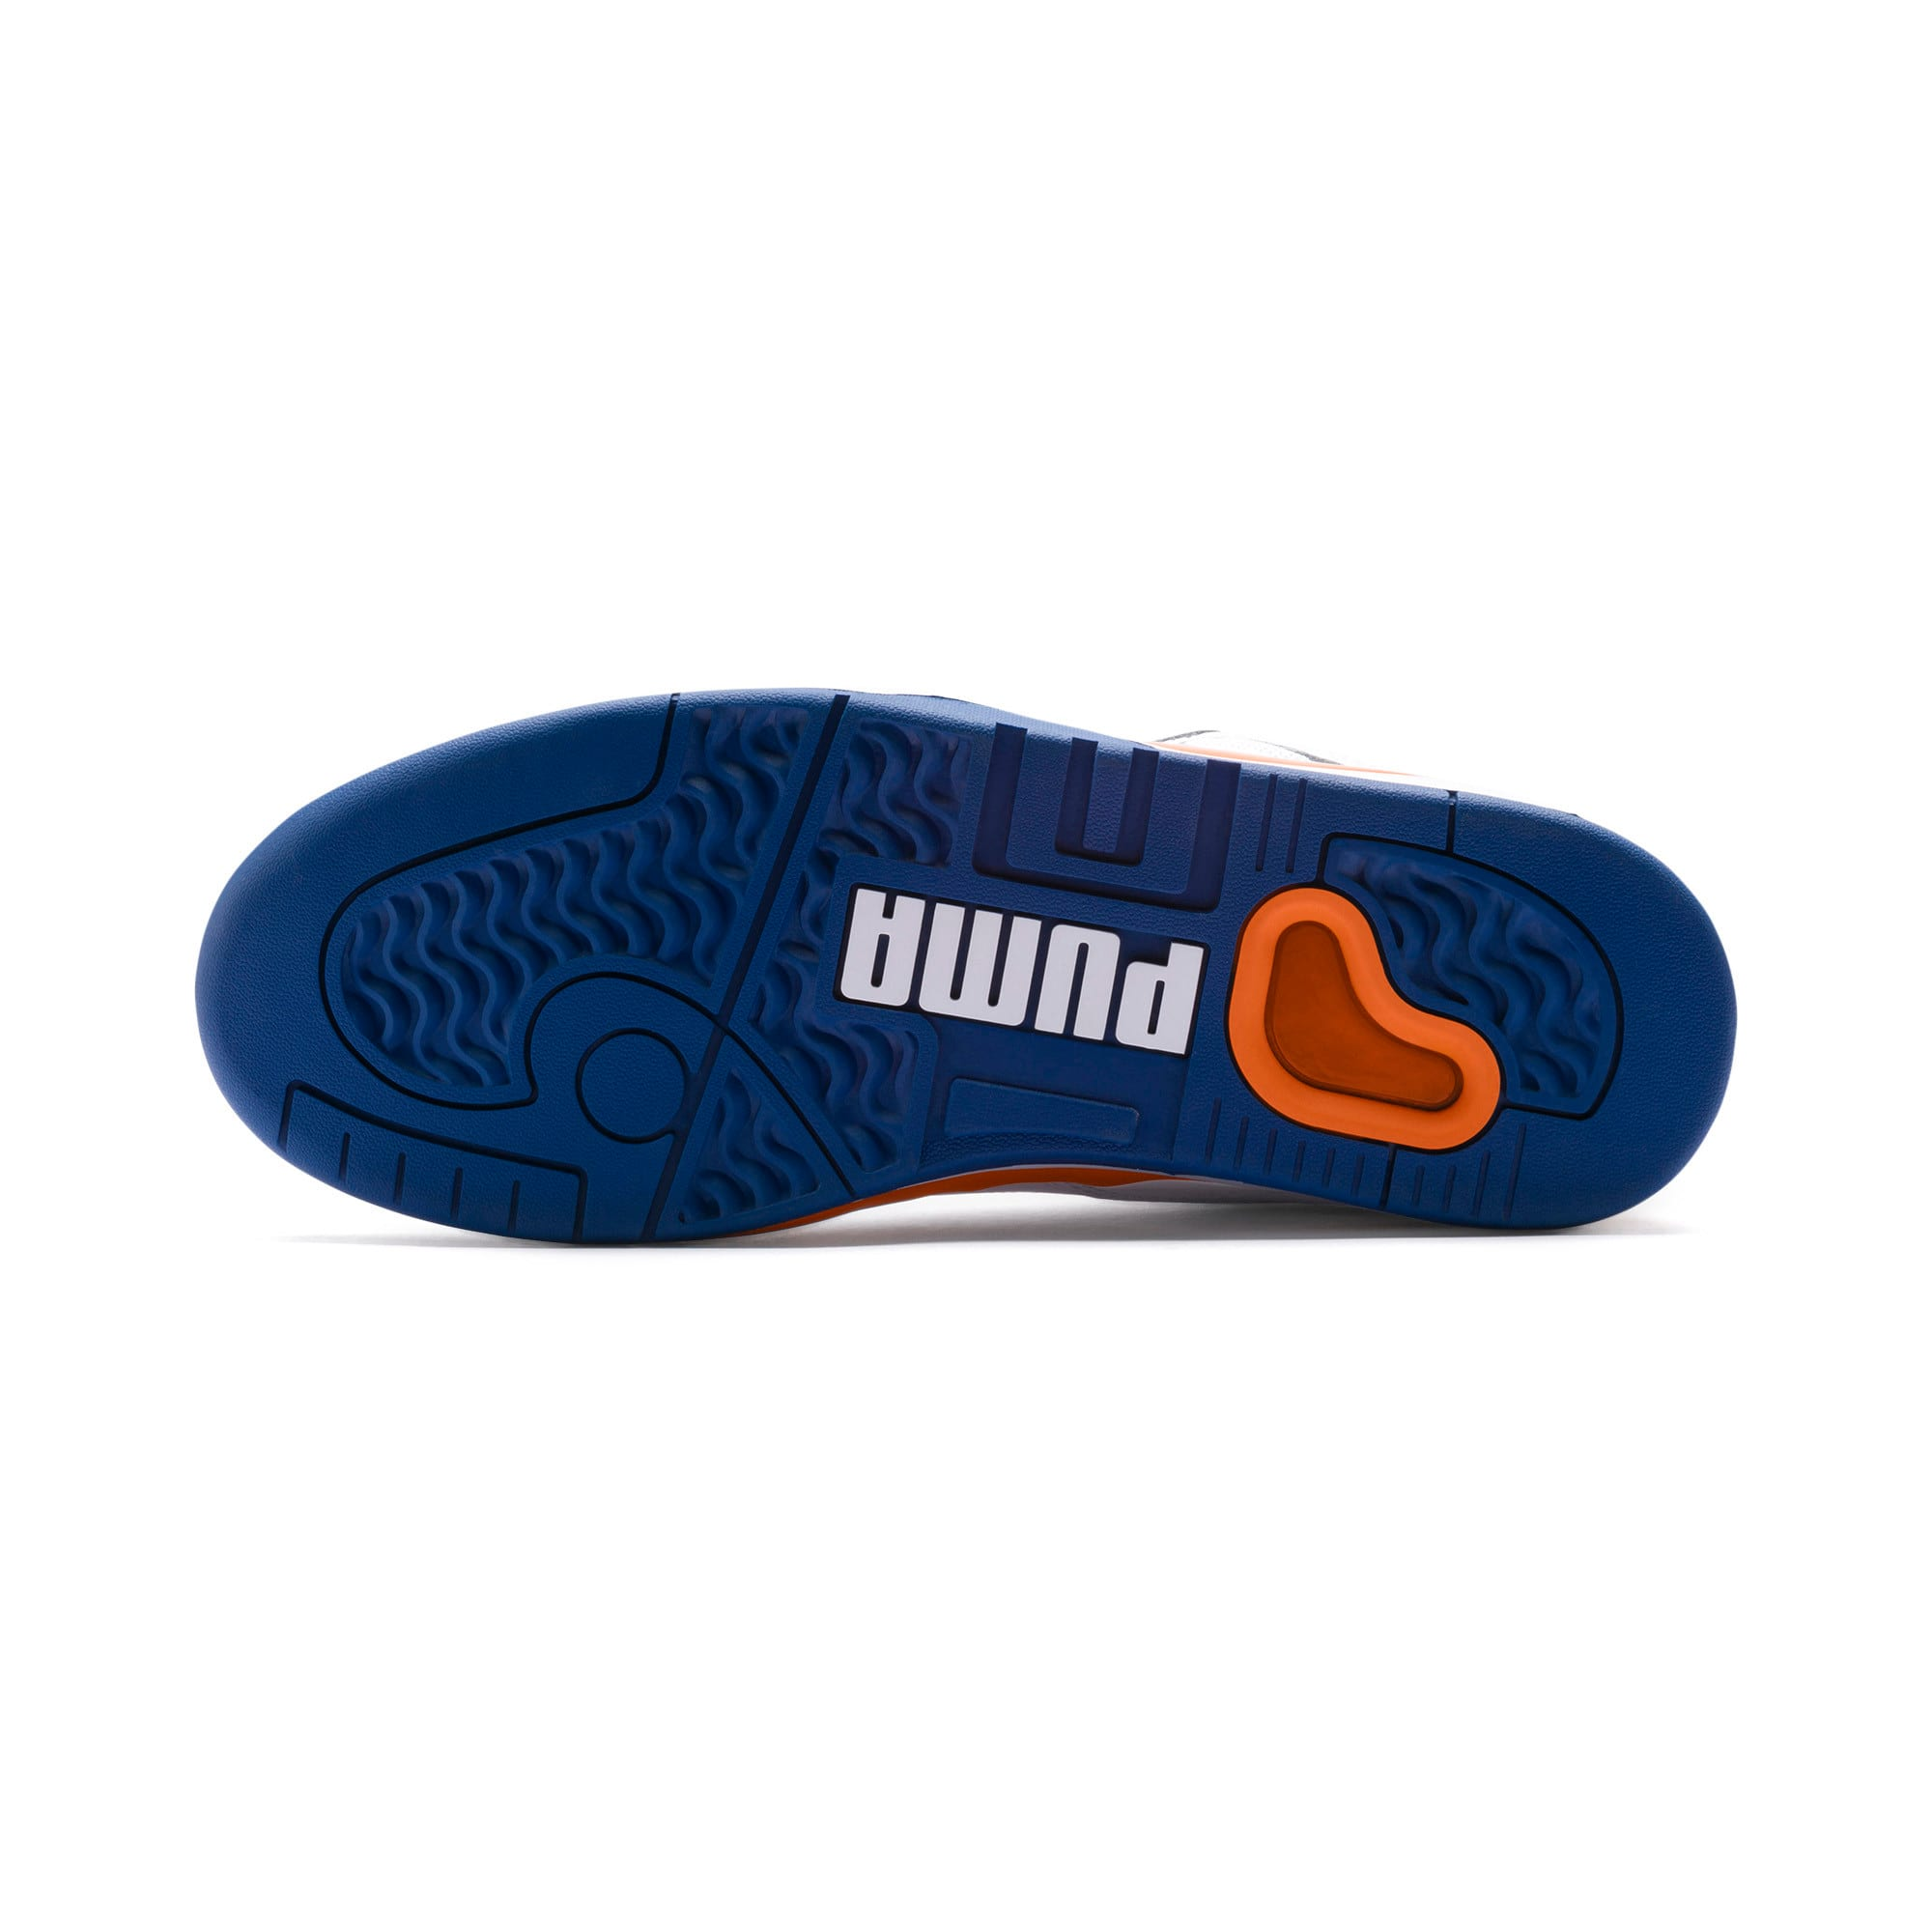 Thumbnail 4 of Palace Guard Sneakers, P White-Jaffa Orange-G Blue, medium